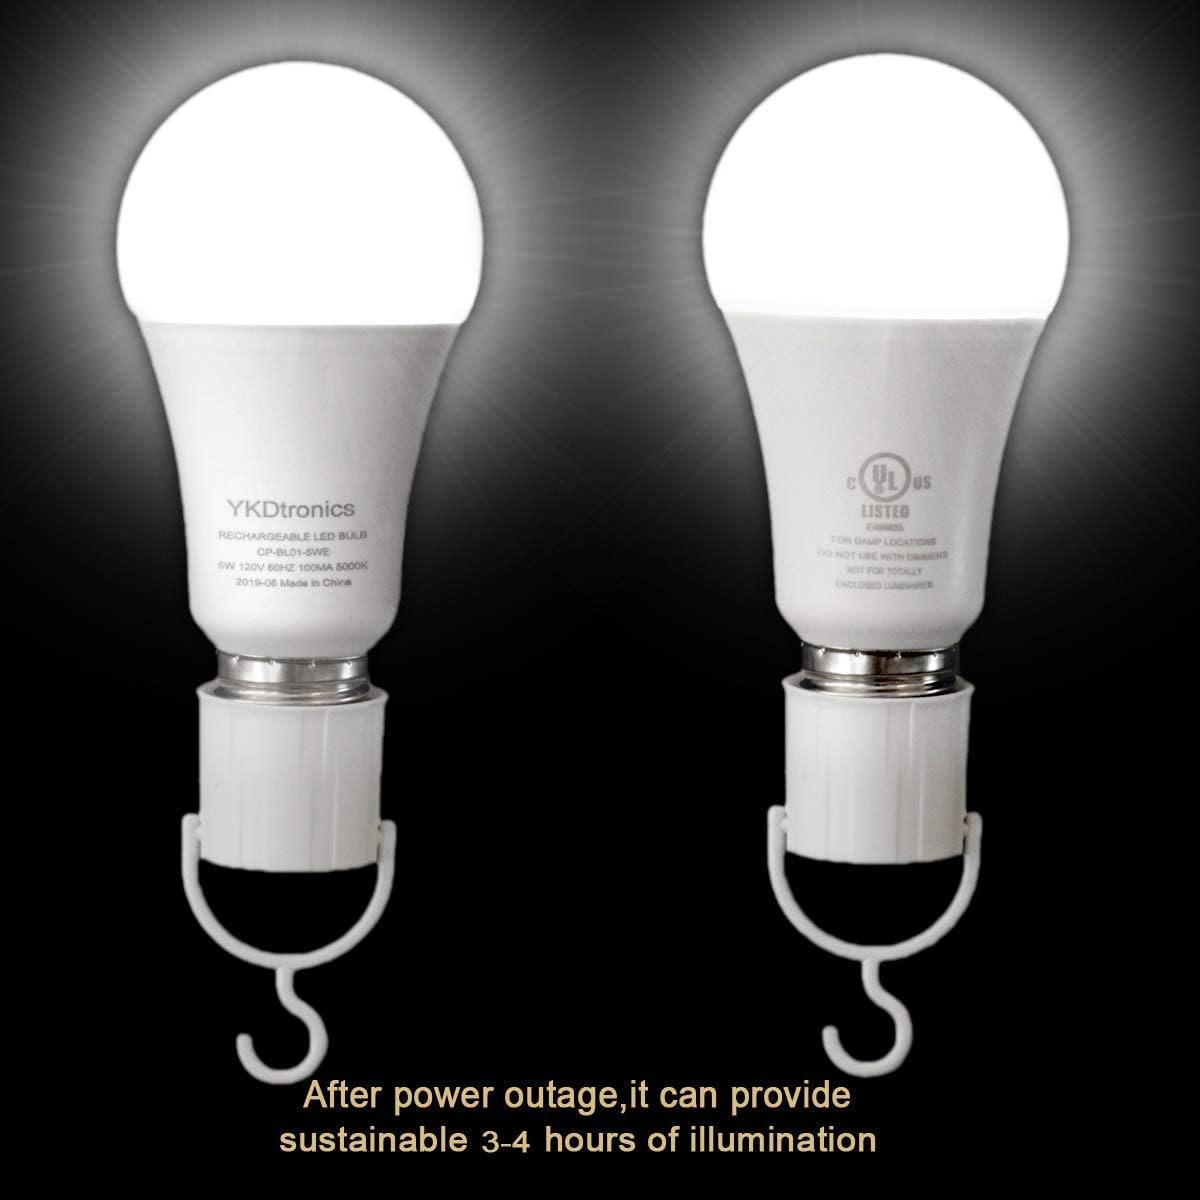 YKDtronics Rechargeable Light Bulbs (2-Pack)